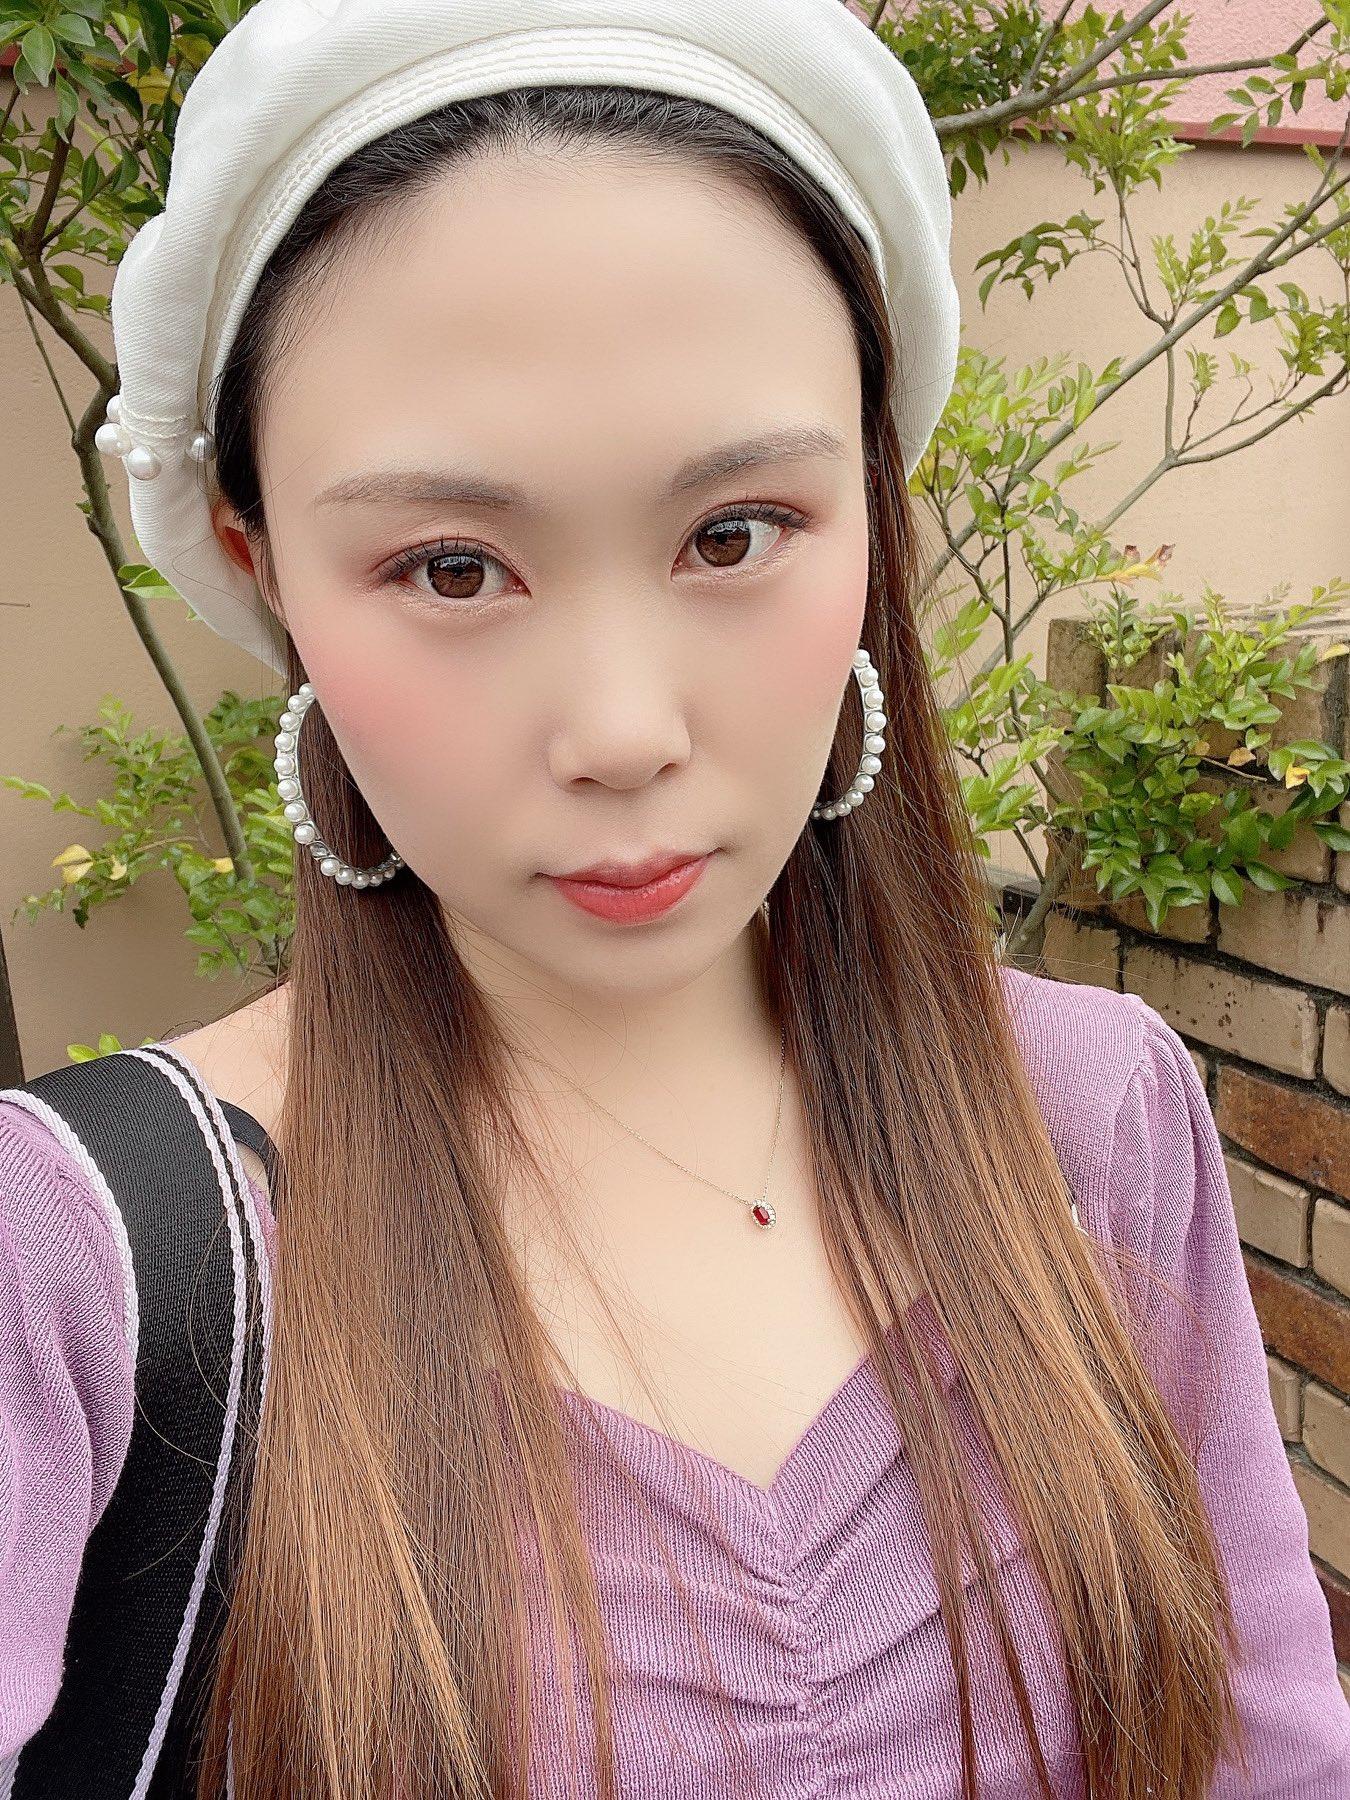 Miyu (Posh Girls Member) Age, Bio, Wiki, Facts & More